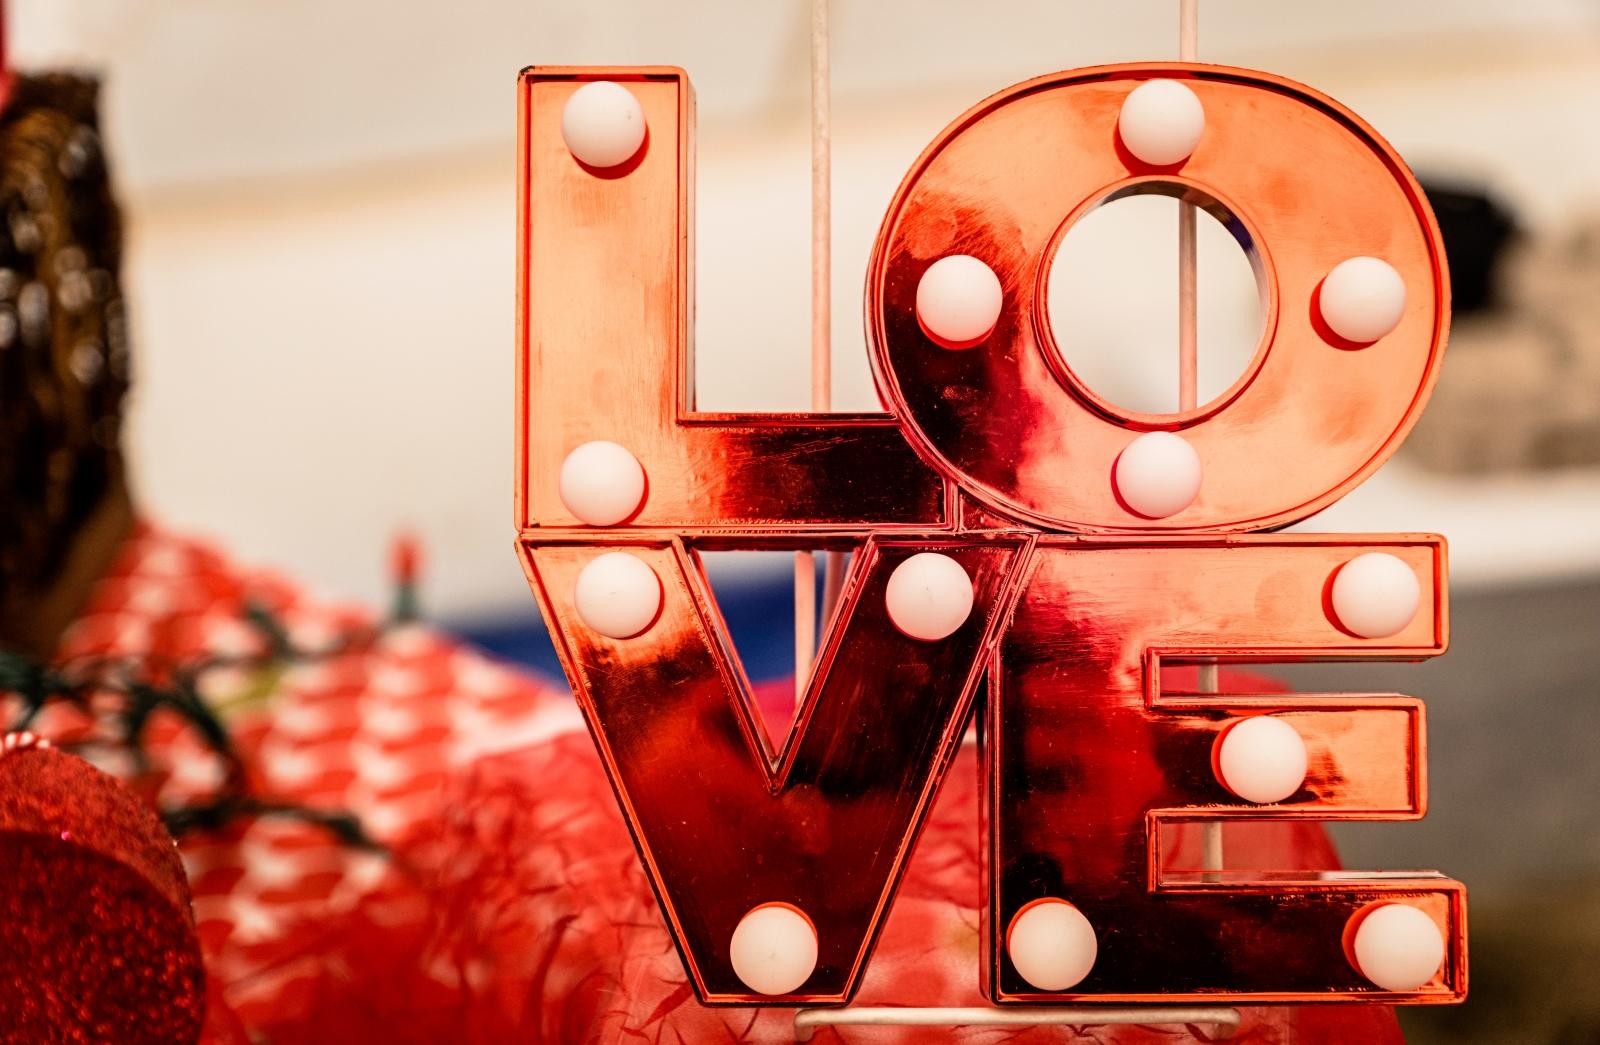 A lit-up LOVE sign. Photo by Jesse Doll.